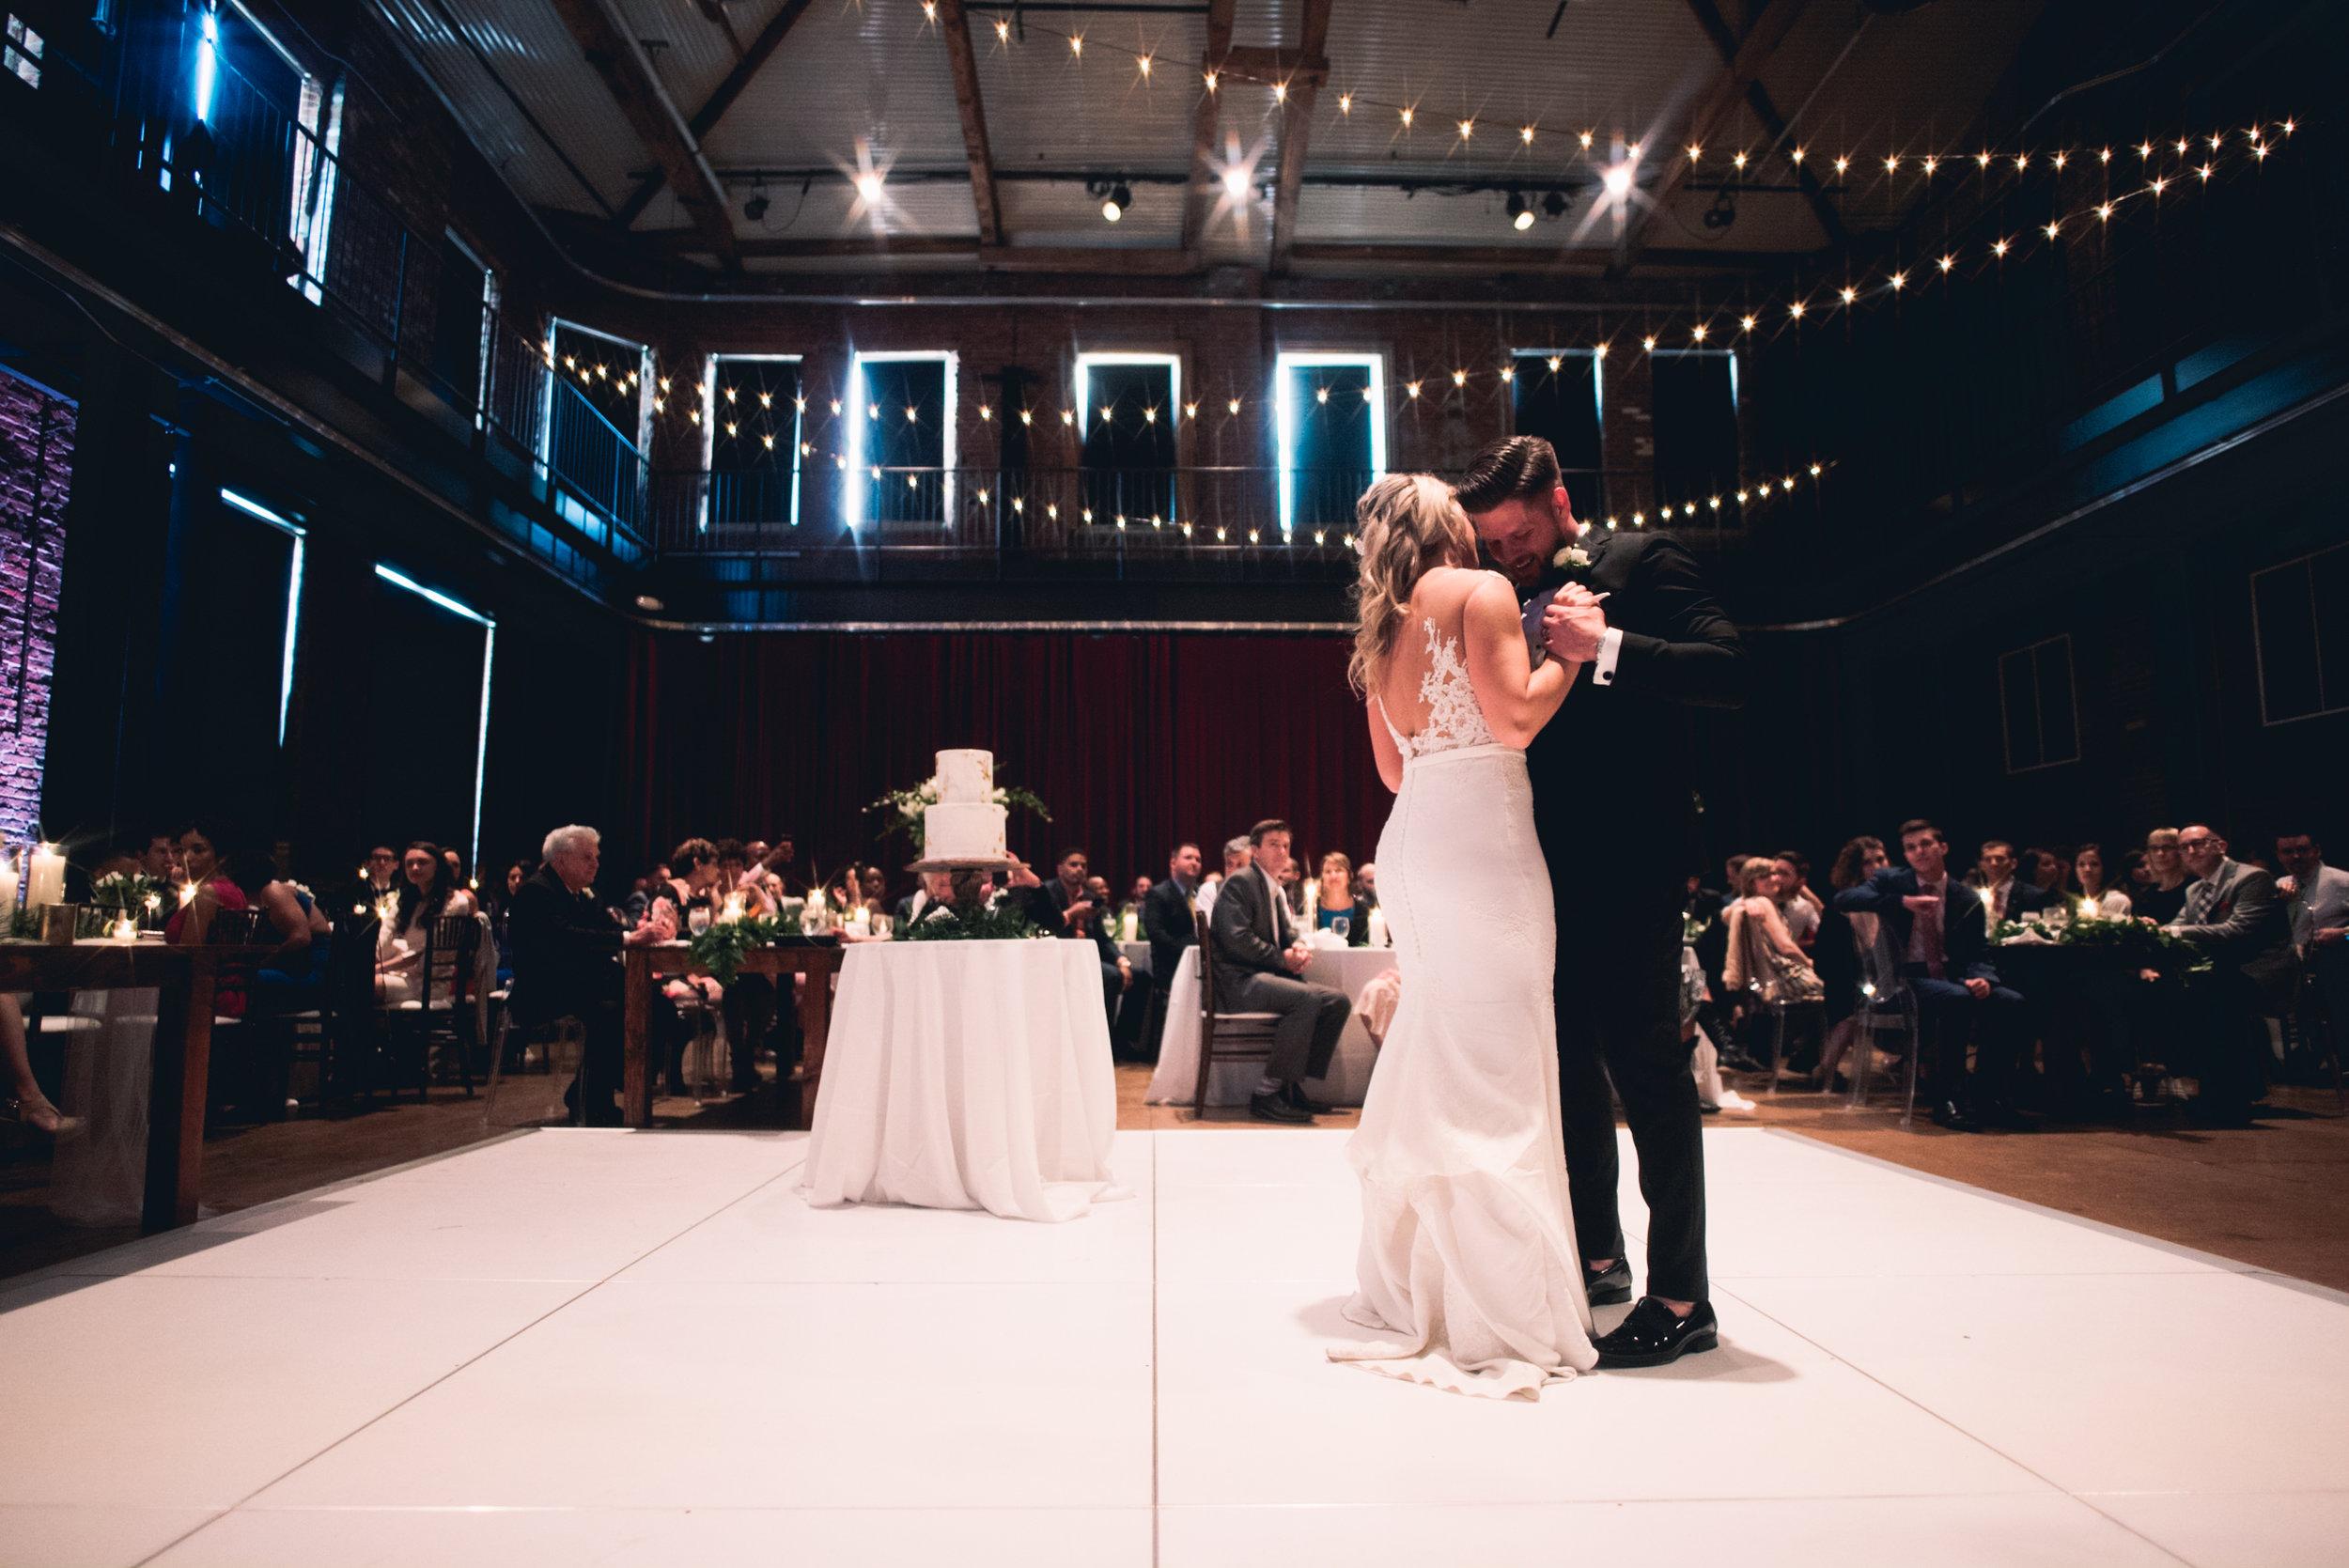 Pittsburgh Pennsylvania New York NYC Wedding Photographer Photojournalist Luxury Downtown Opera - Stirpe 1324.jpg